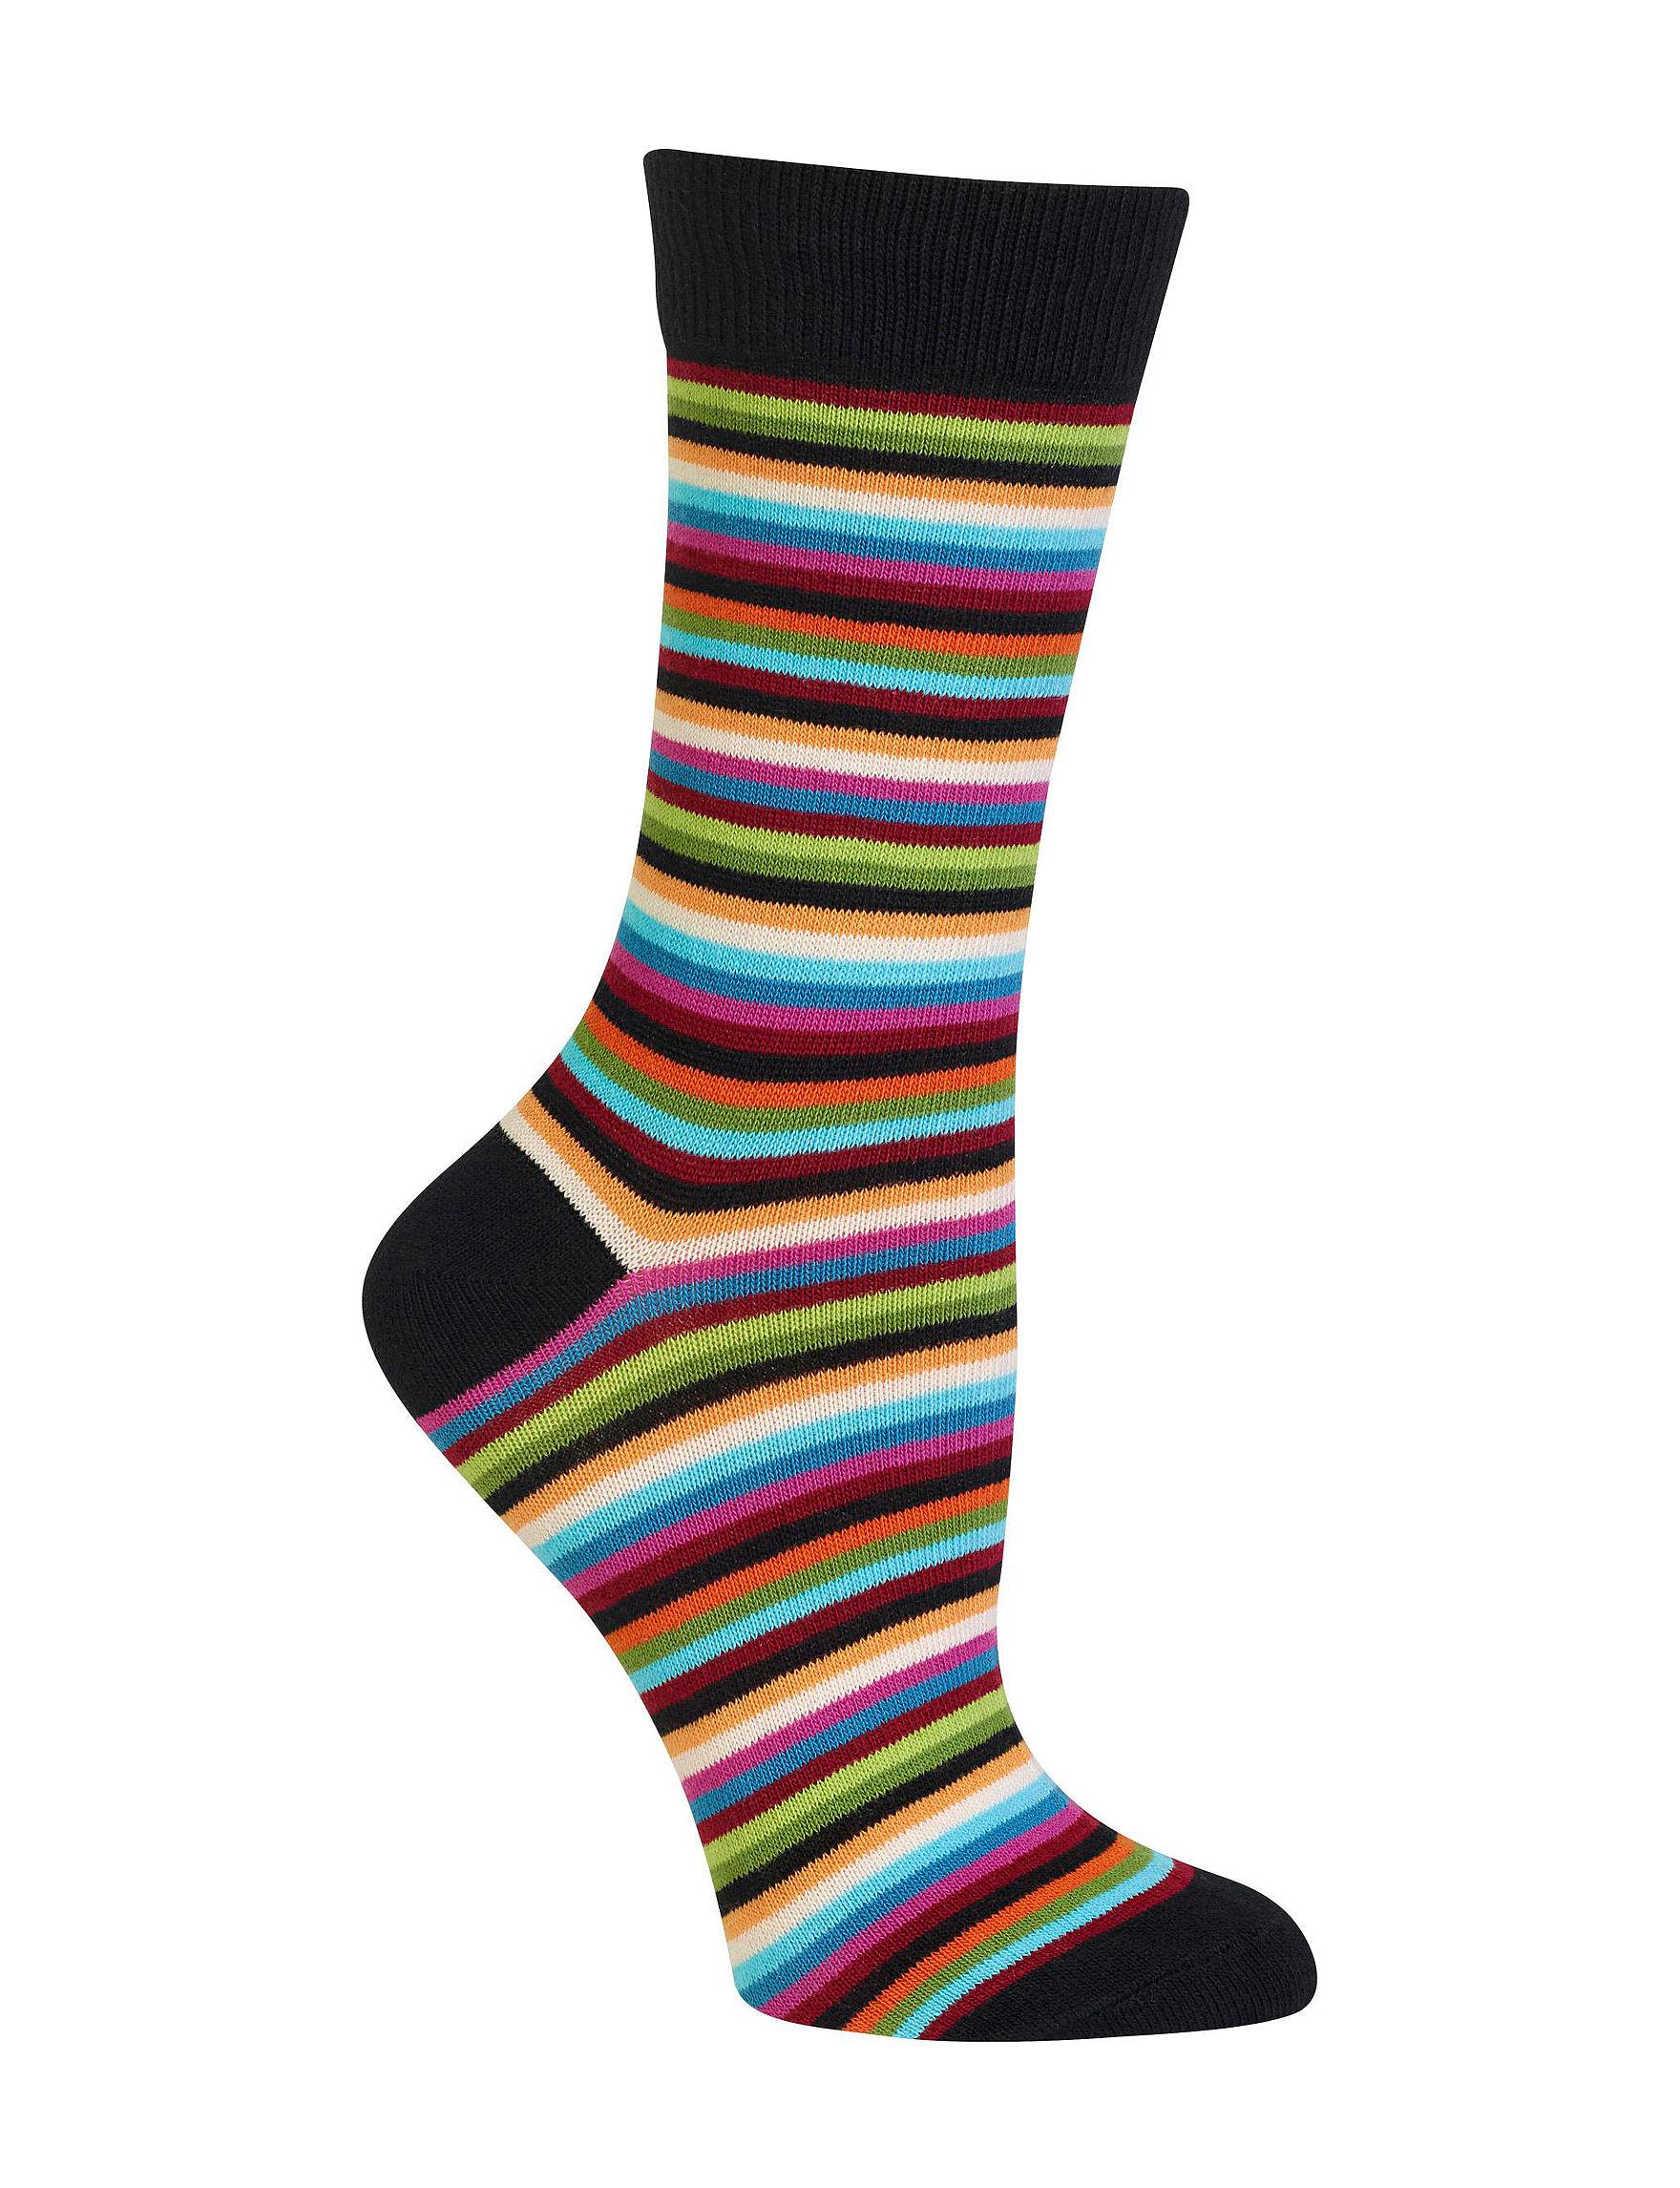 Hot Sox Black Socks